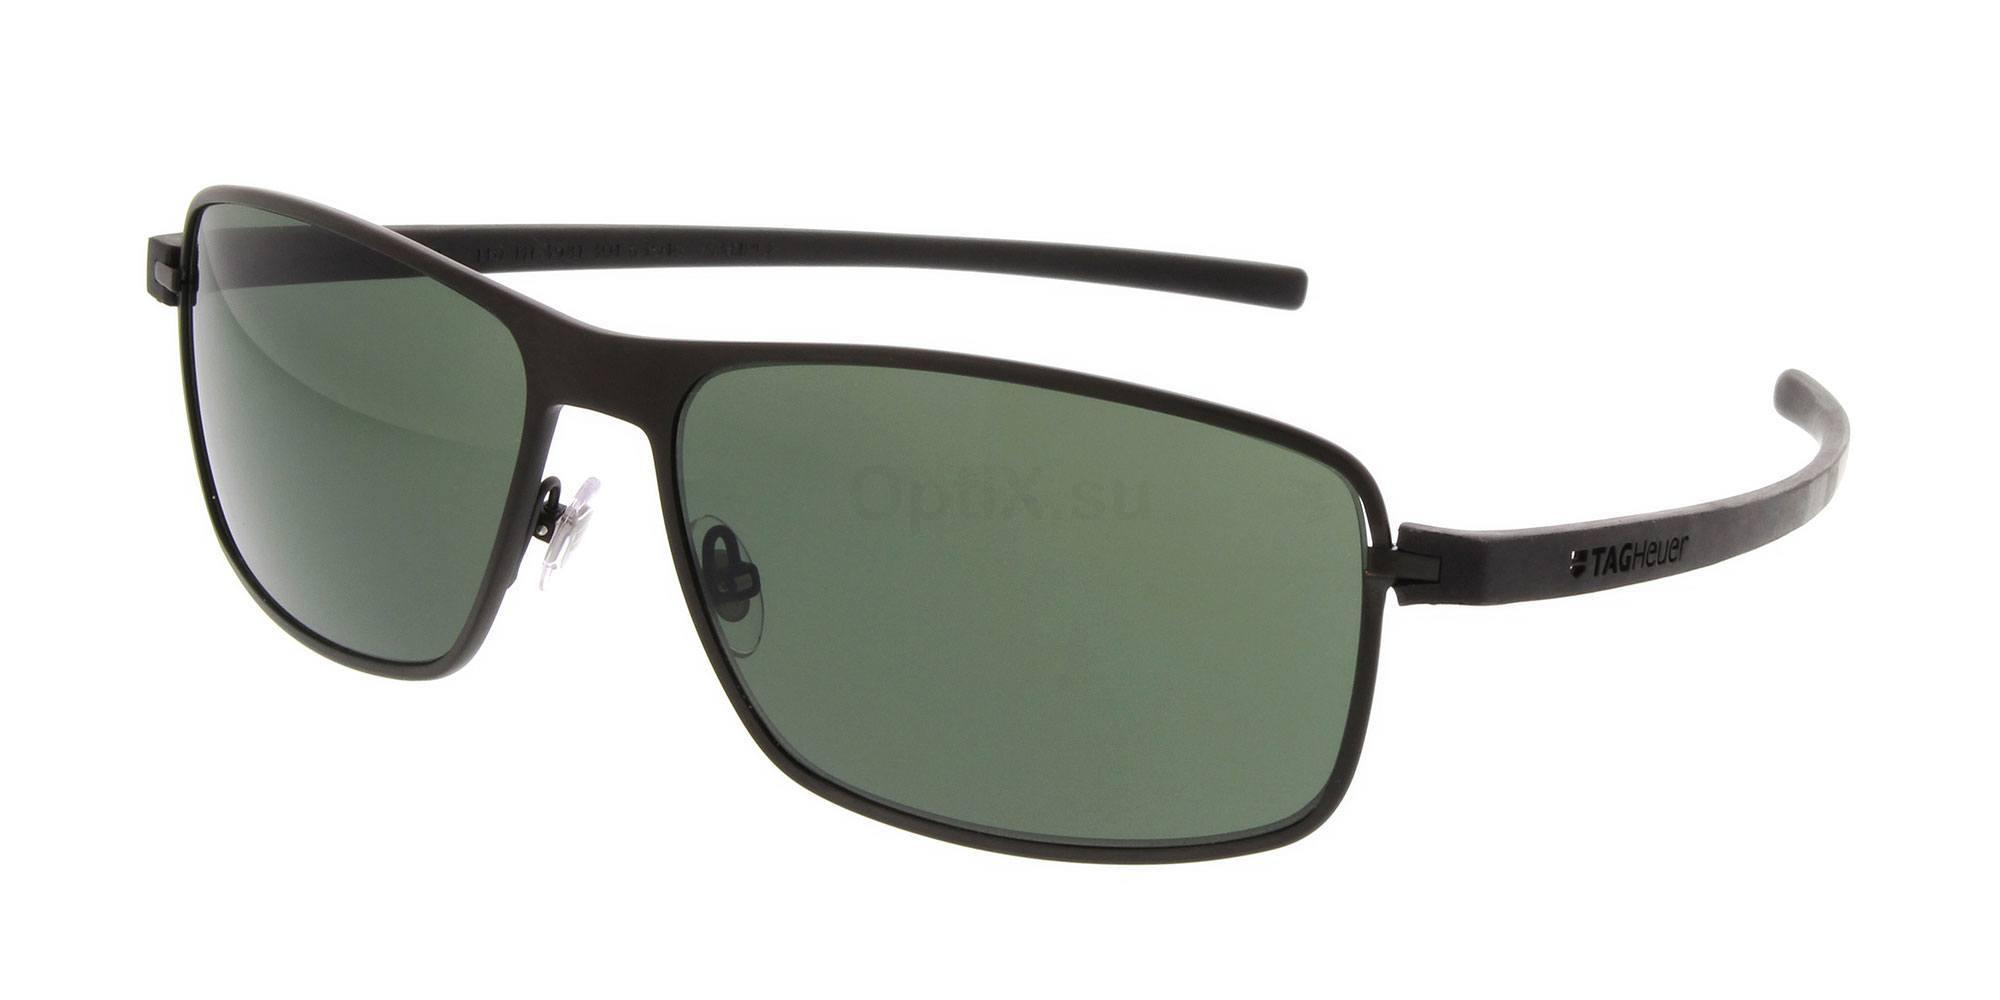 301 Reflex 3 Rimmed 3981 Sunglasses, TAG Heuer